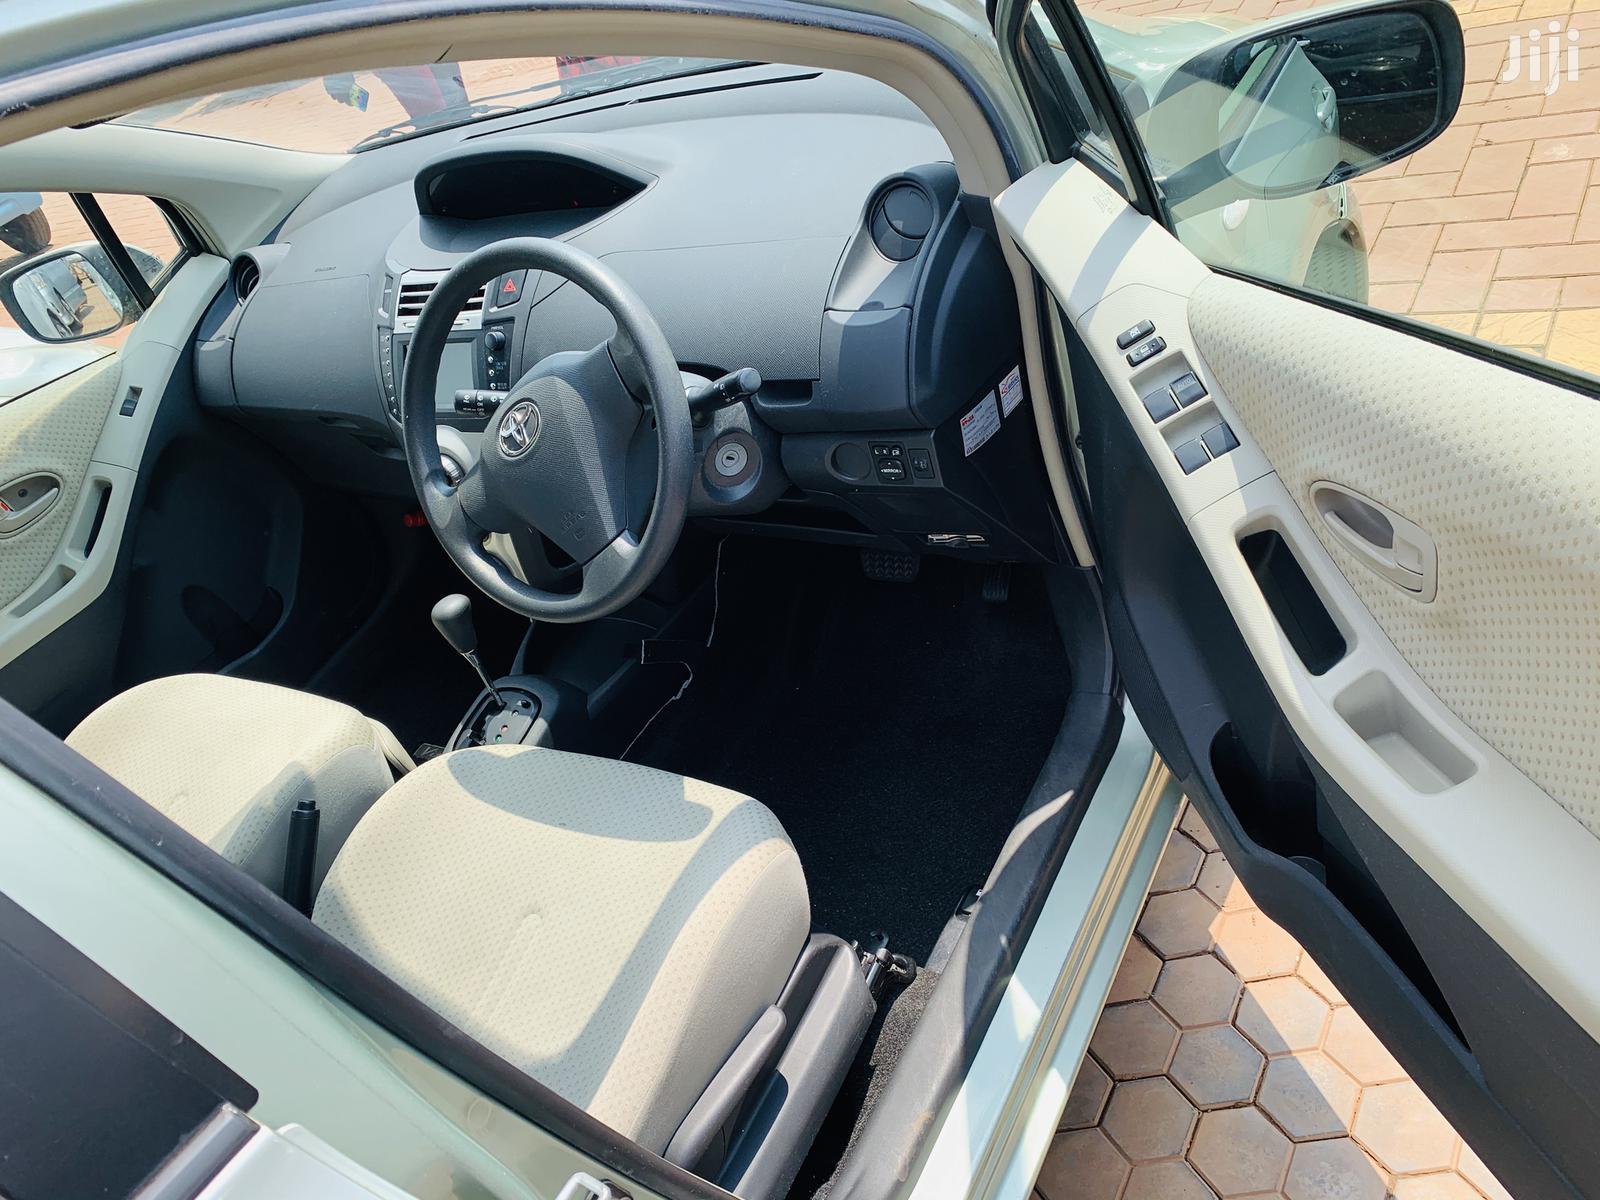 Toyota Vitz 2007 Green   Cars for sale in Kampala, Central Region, Uganda